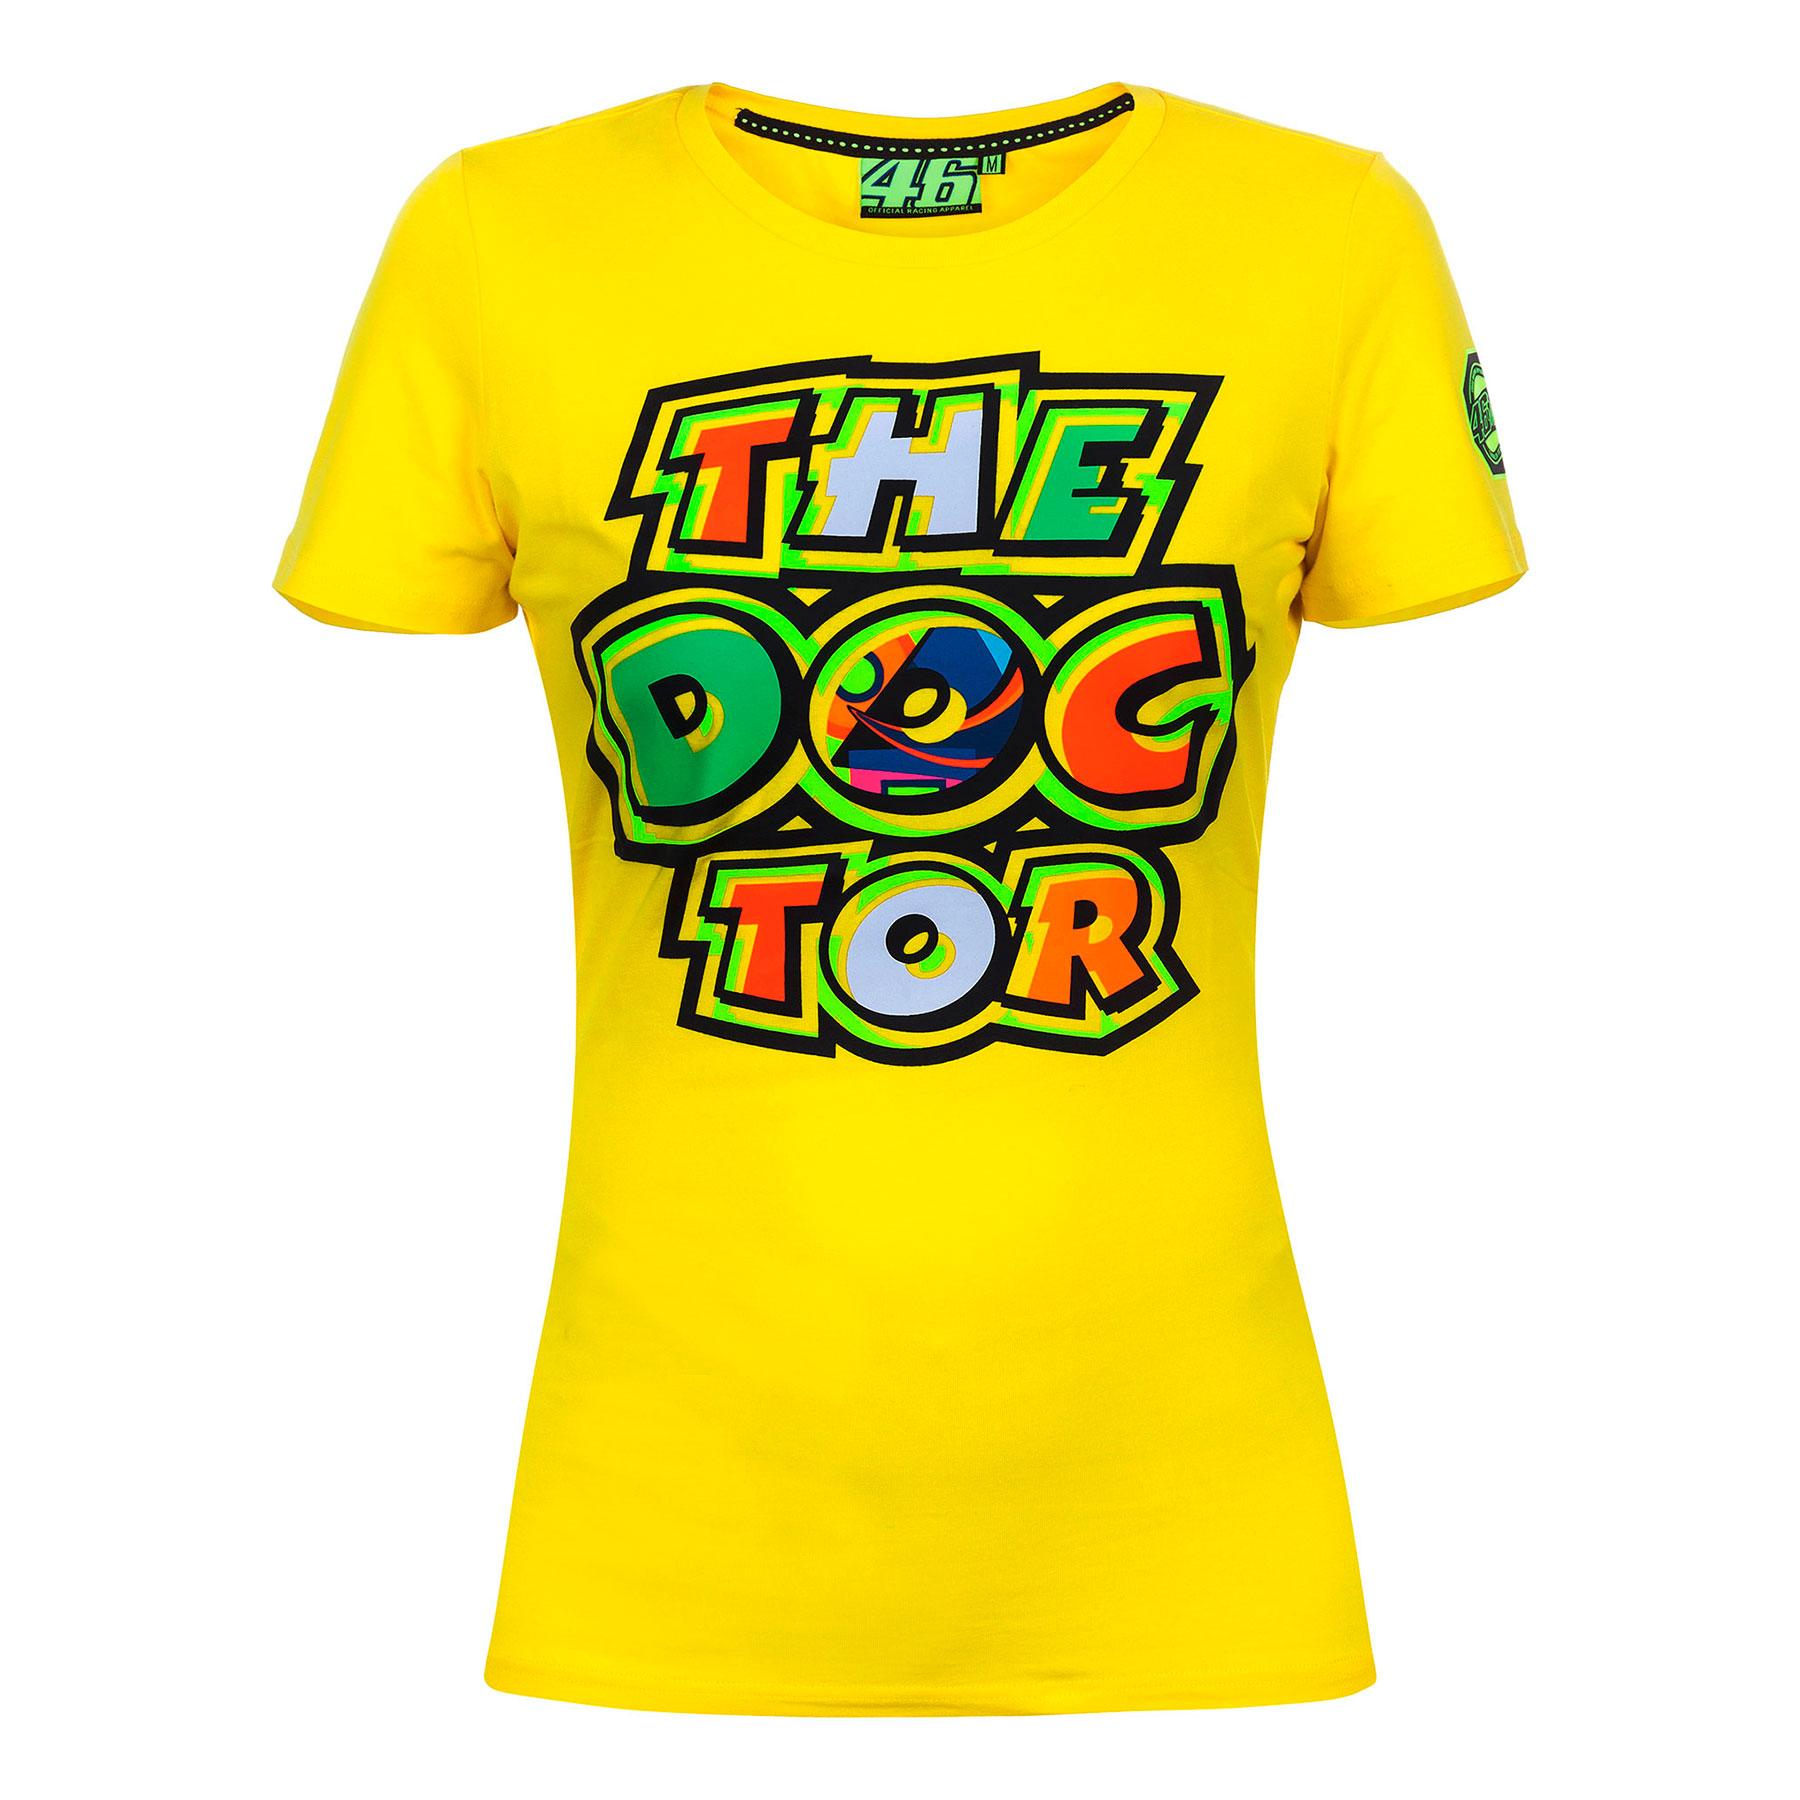 fb28e52a05 Camiseta Valentino Rossi Mujer The Doctor Amarilla 2017 en Motorbike ...